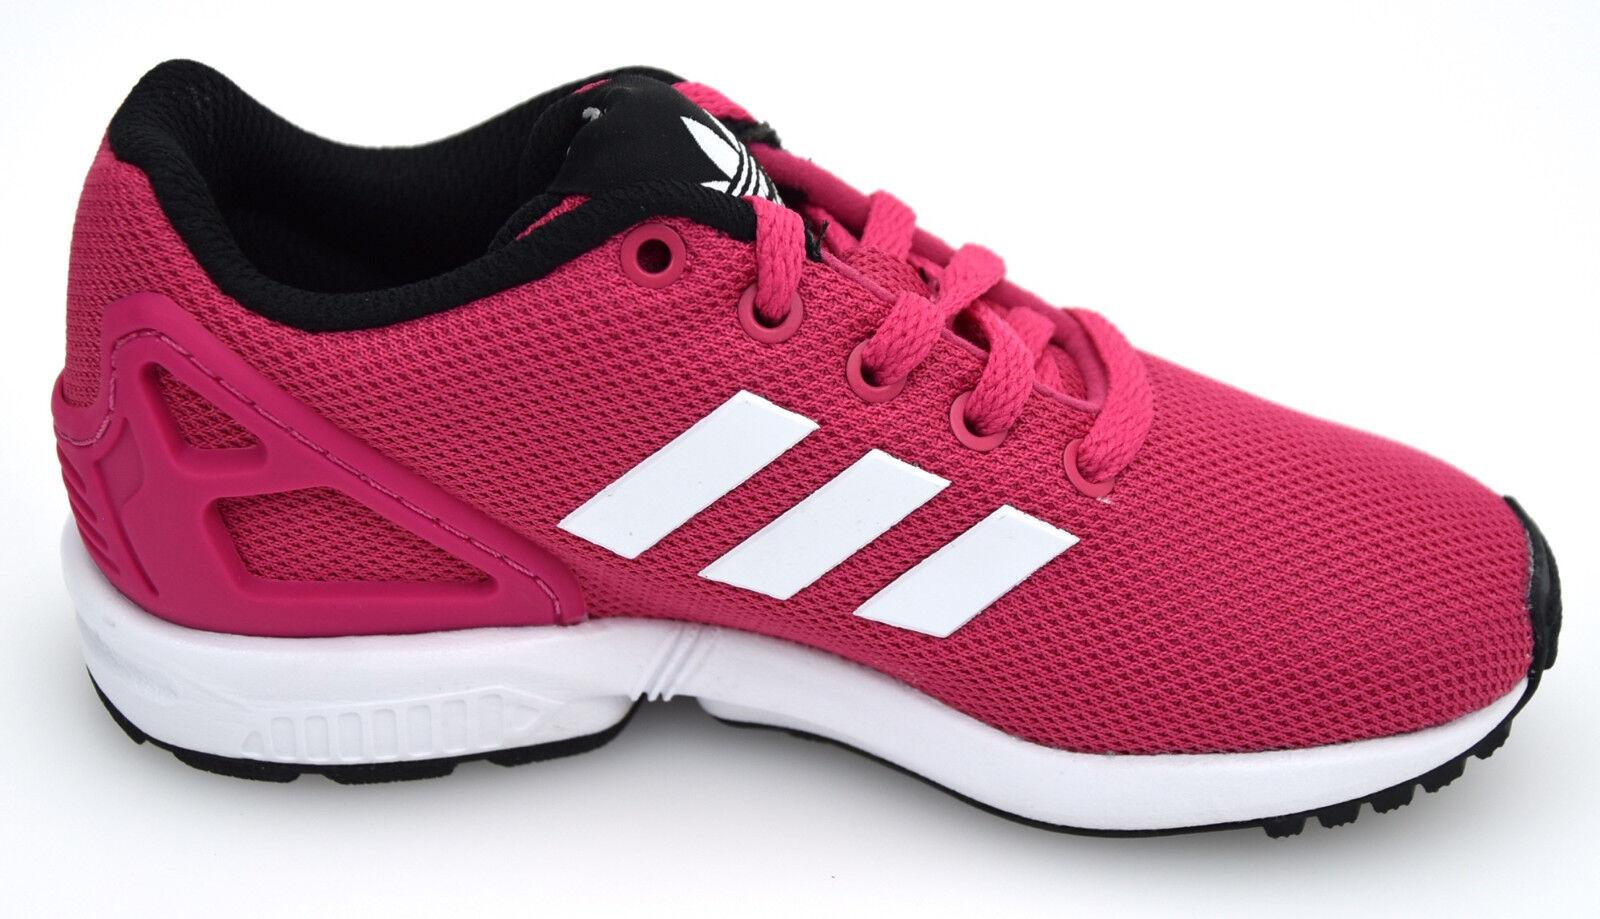 Womens ADIDAS ZX FLUX K NEUF ROUGE gr:36 2/3 s74952 Basket Chaussures Tubular Samba